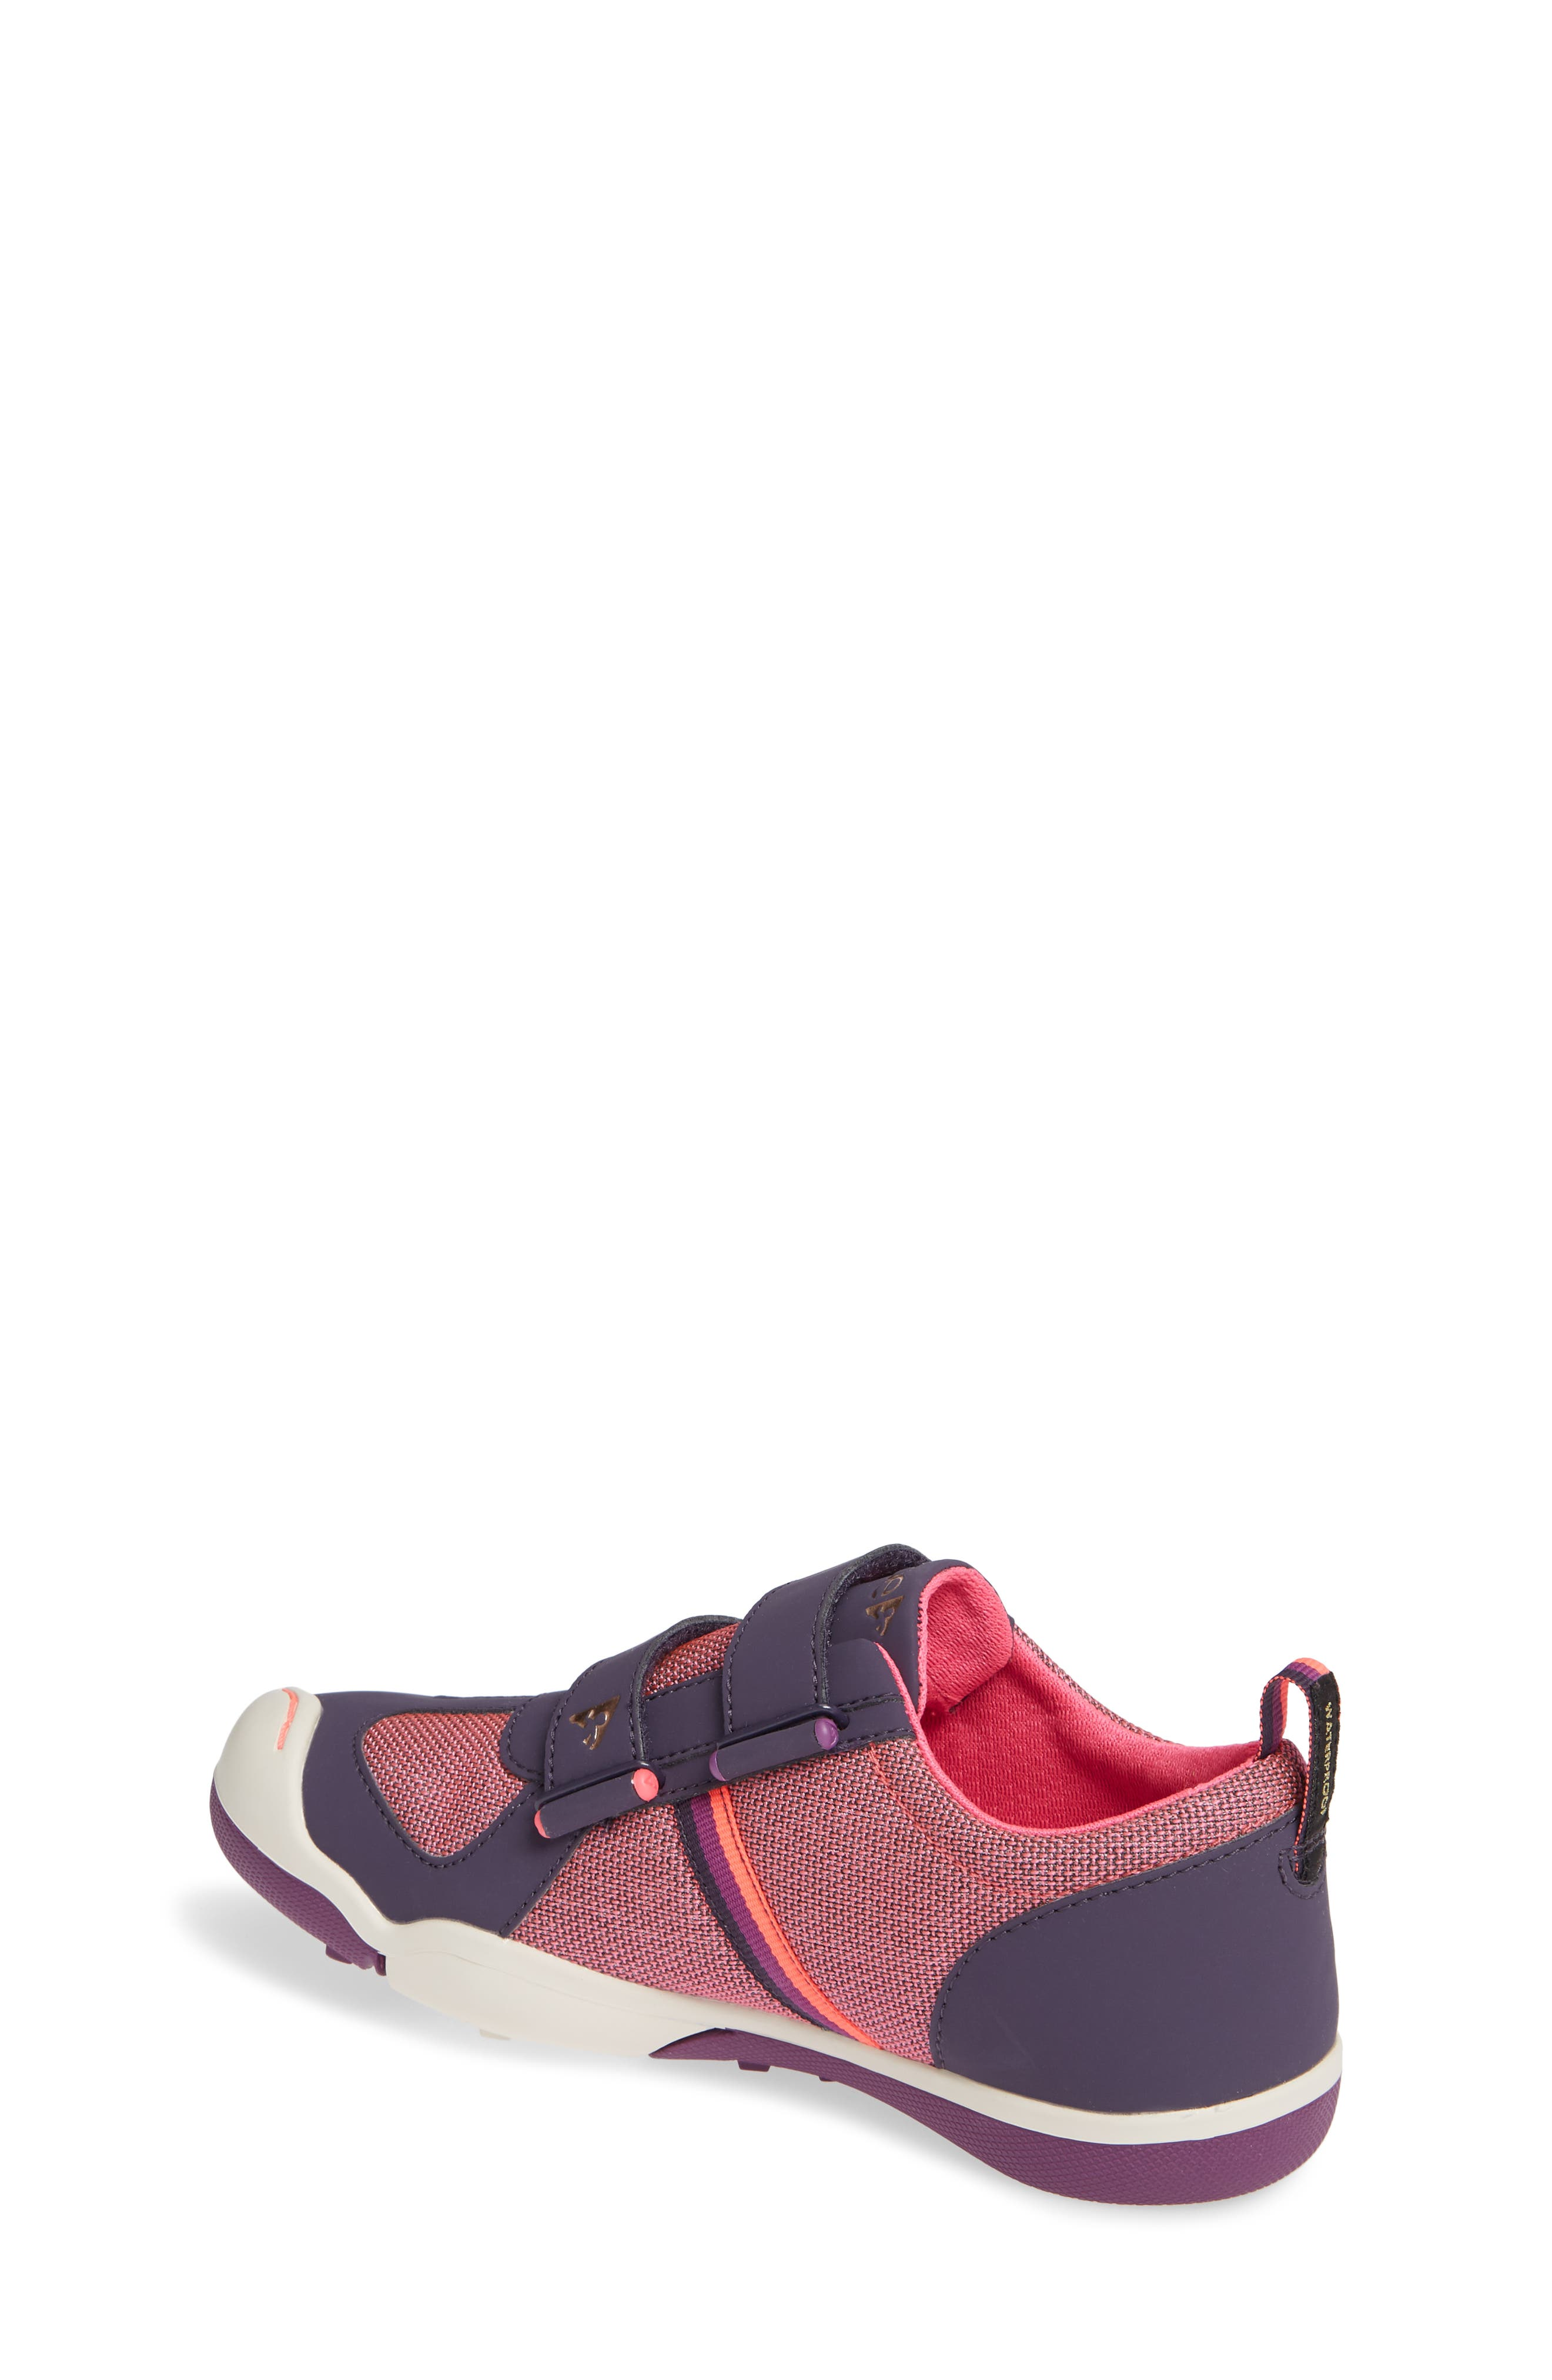 Charlie Customizable Waterproof Sneaker,                             Alternate thumbnail 2, color,                             MYSTIC BERRY